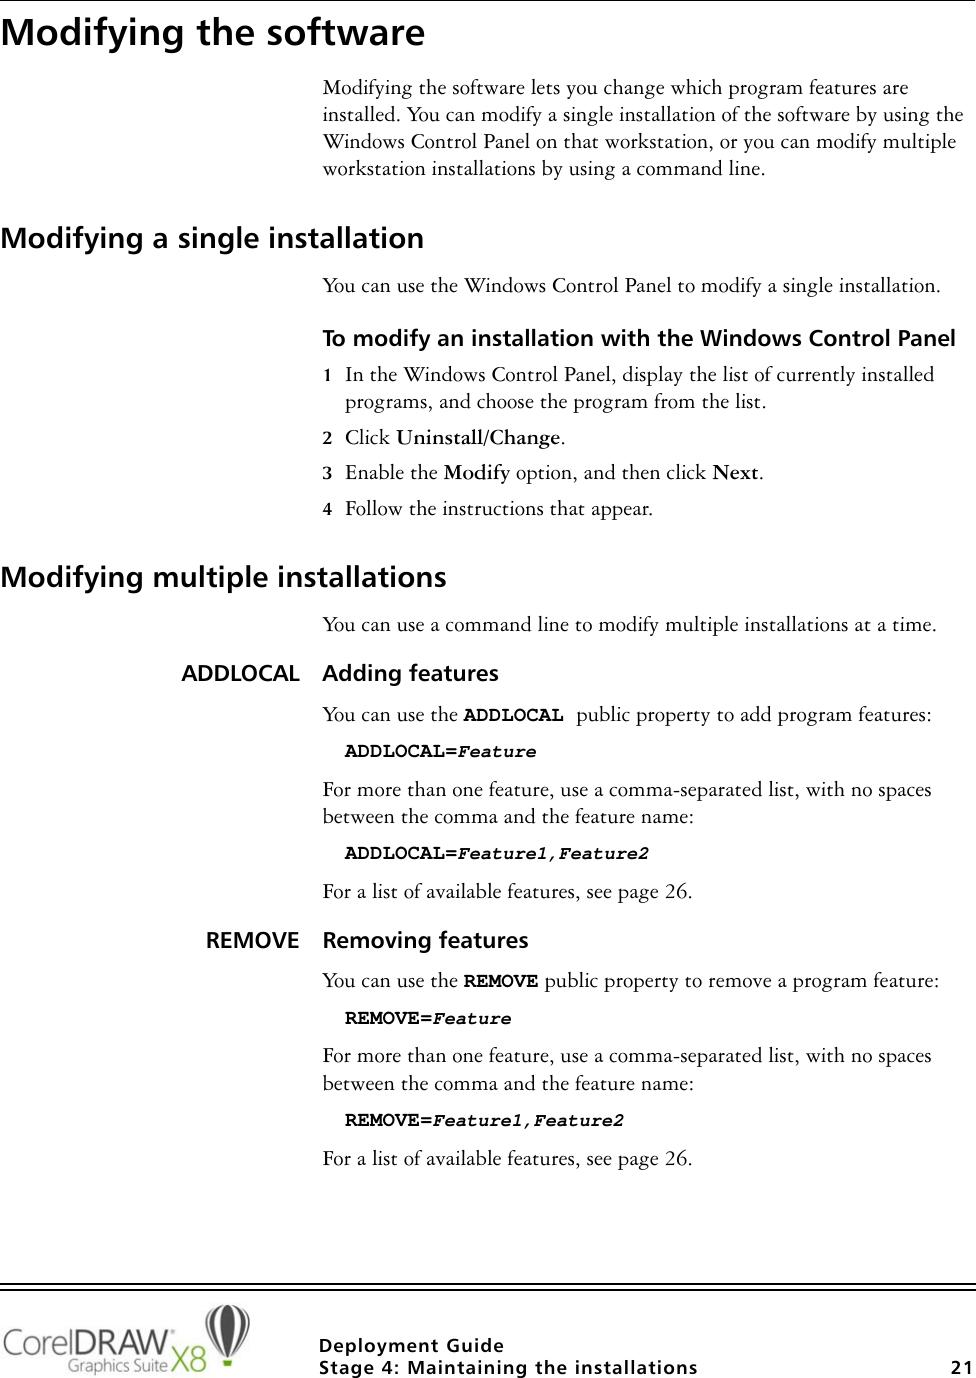 Corel CorelDRAW Graphics Suite X8 Deployment Guide Draw DG EN